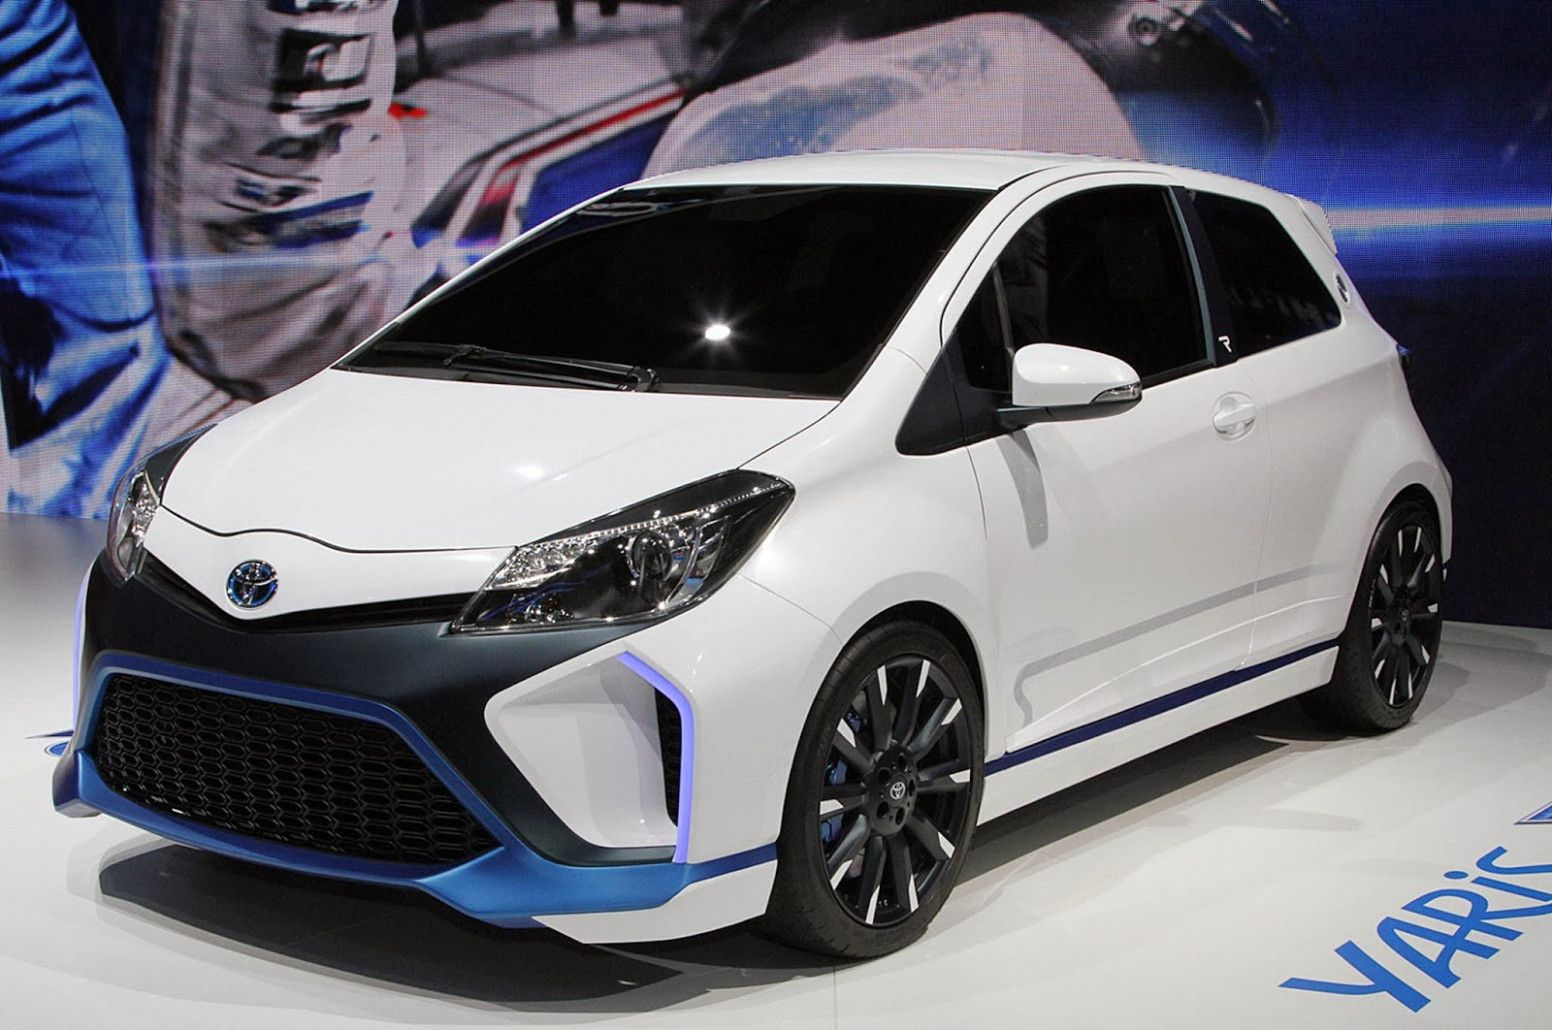 7 Picture Toyota Vitz 2020 Price In Pakistan In 2020 Yaris Toyota Cars Toyota